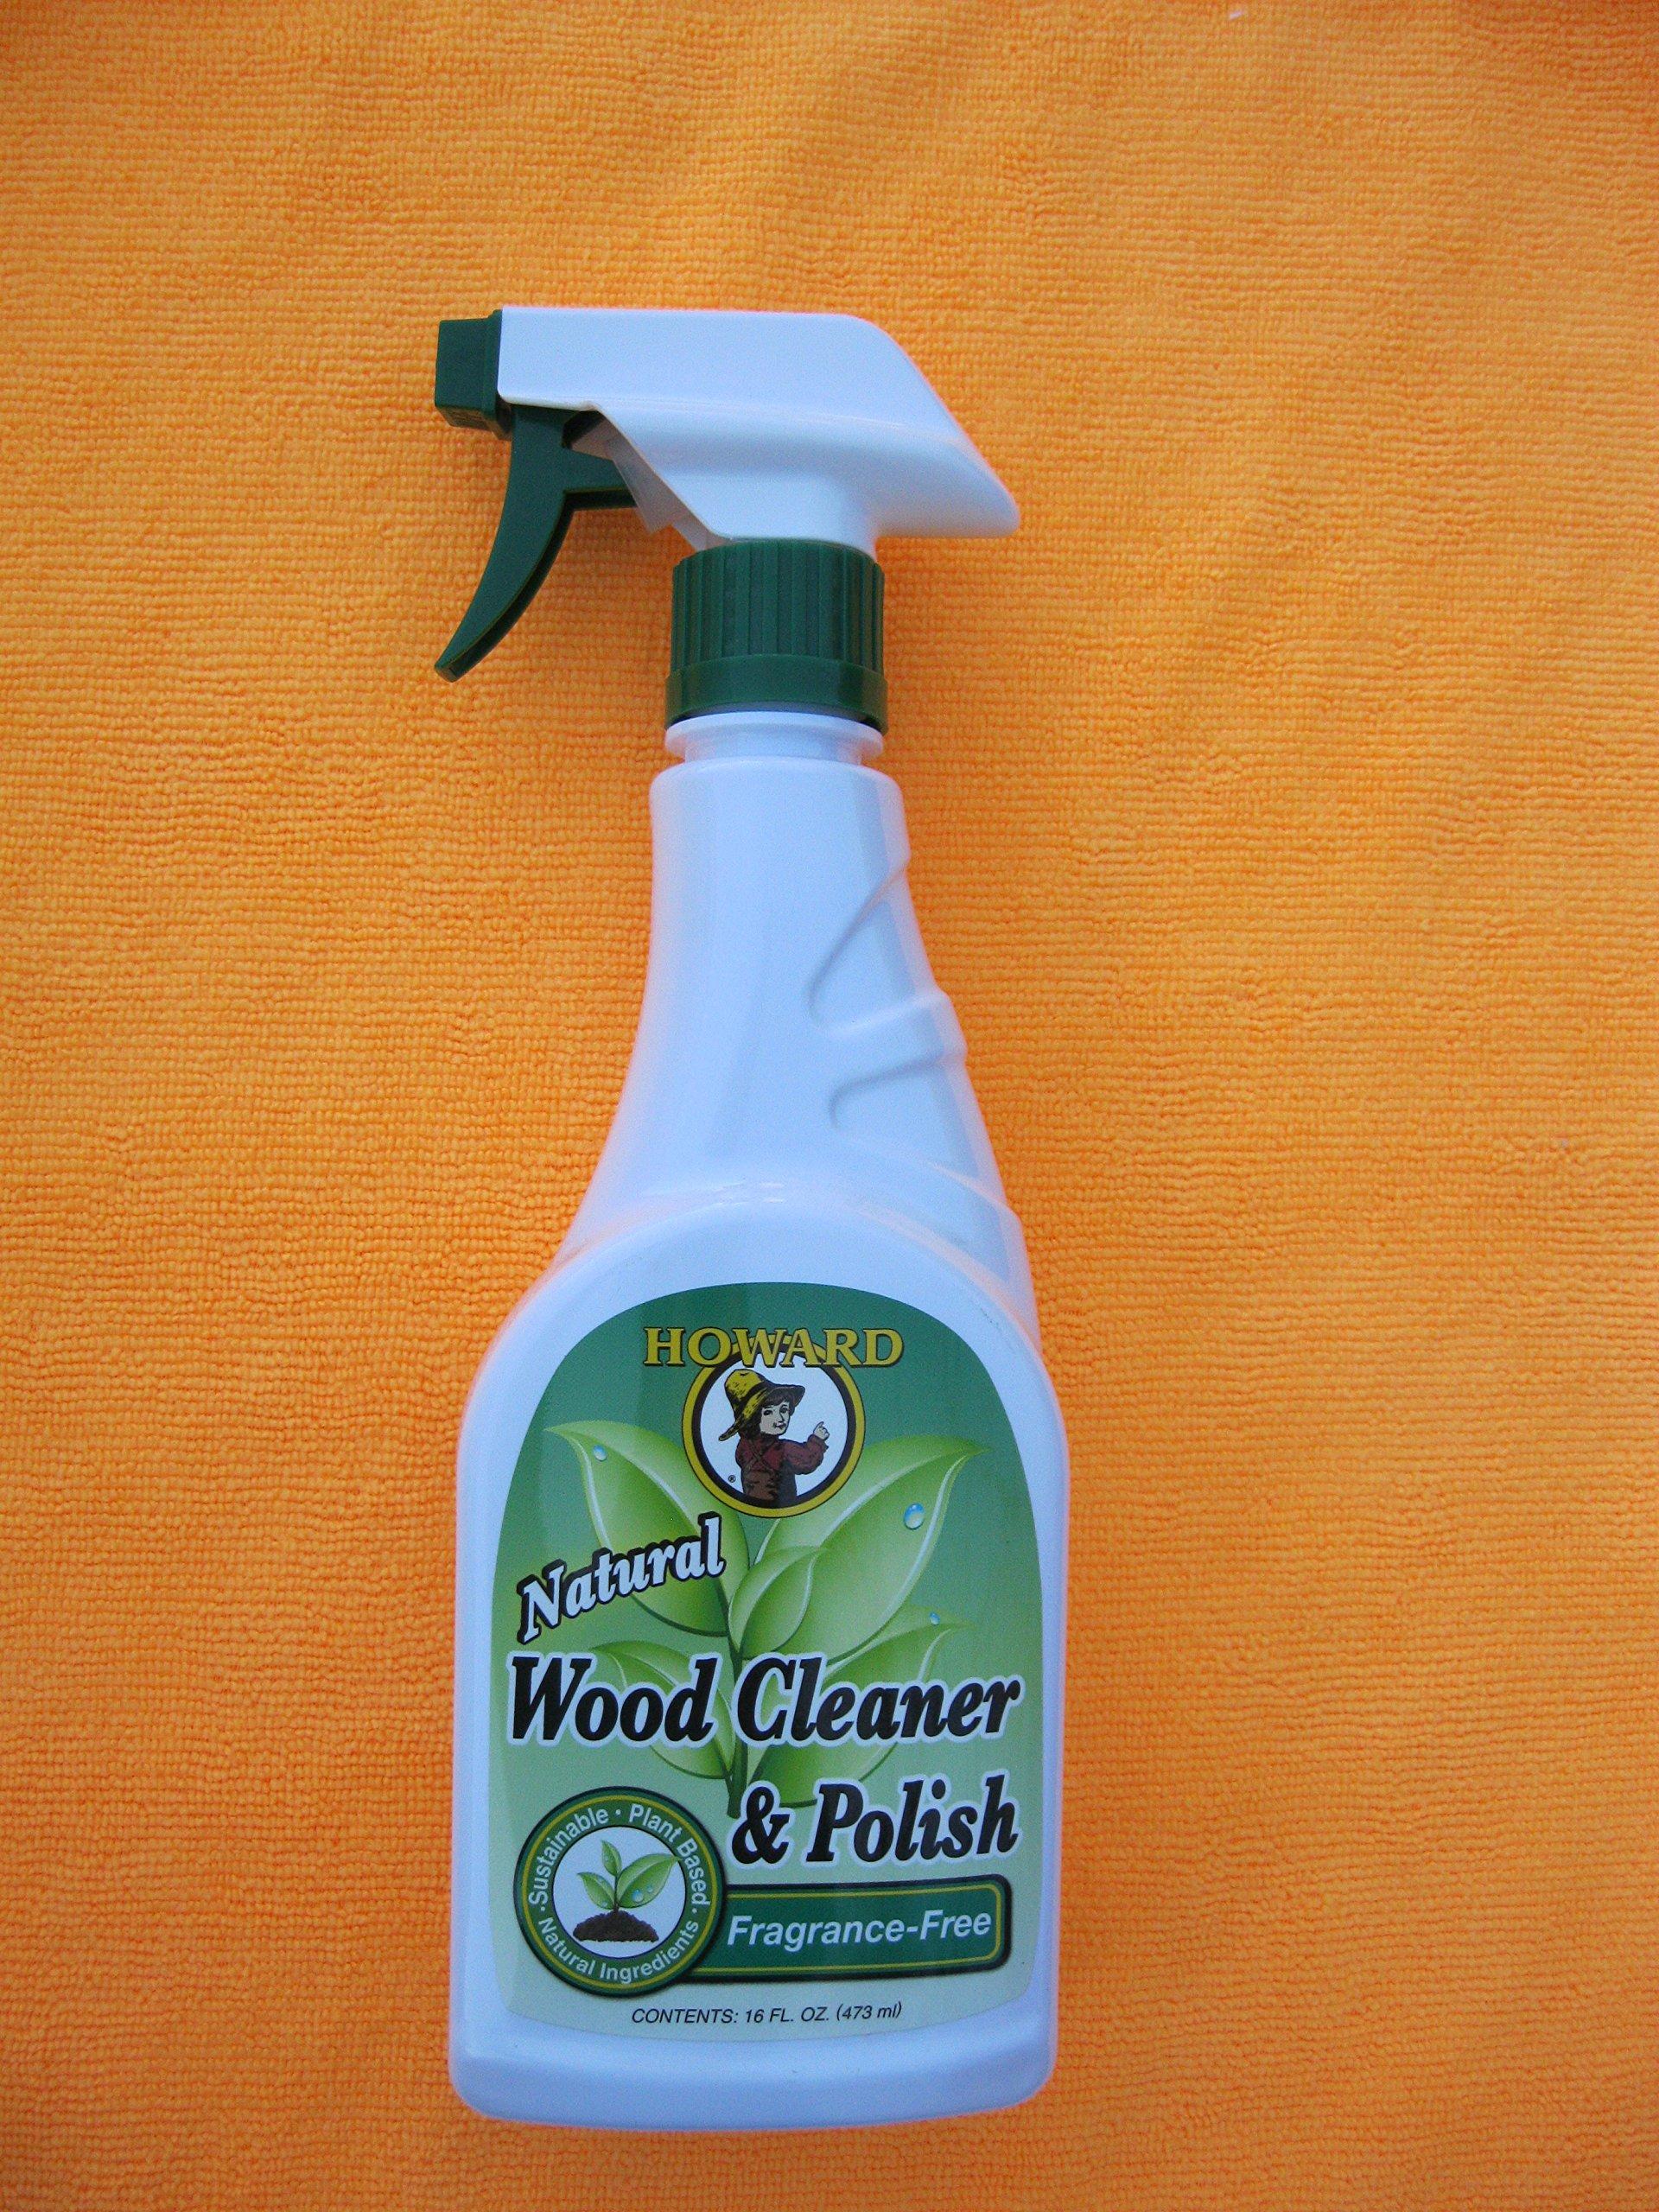 Howard All Natural Wood Furniture Cleaner and Polish - Fragrance Free Natural Wood Polish with Microfiber Cloth (Orange)